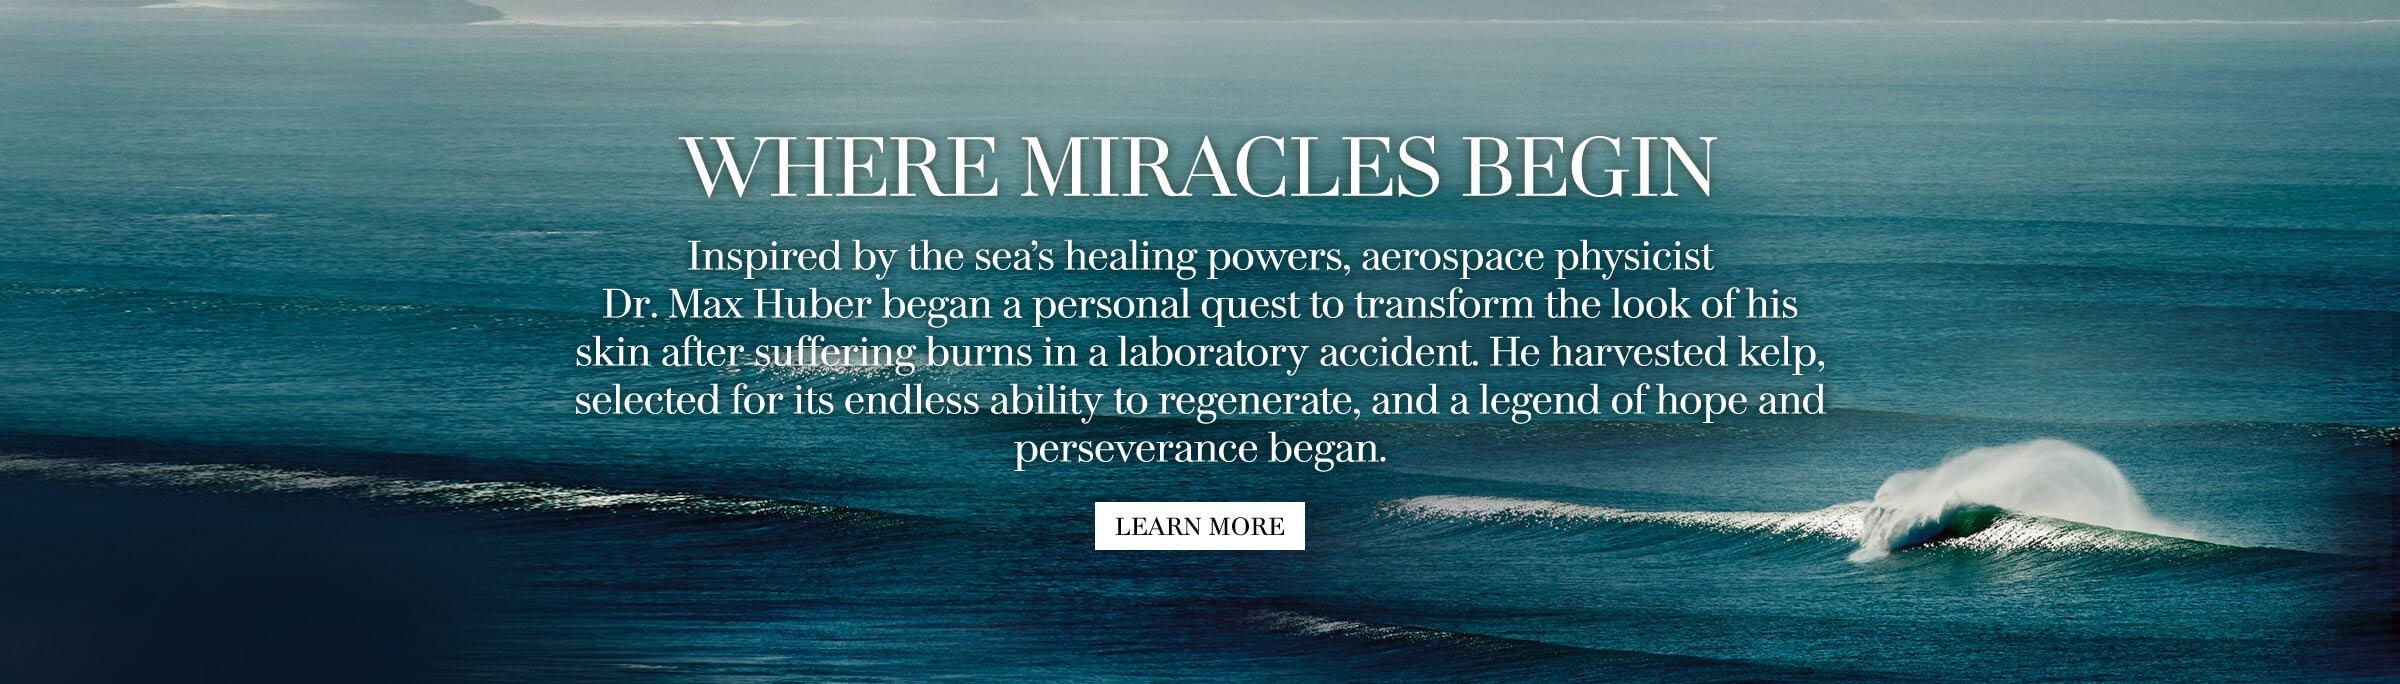 La Mer - Where Miracles Begin